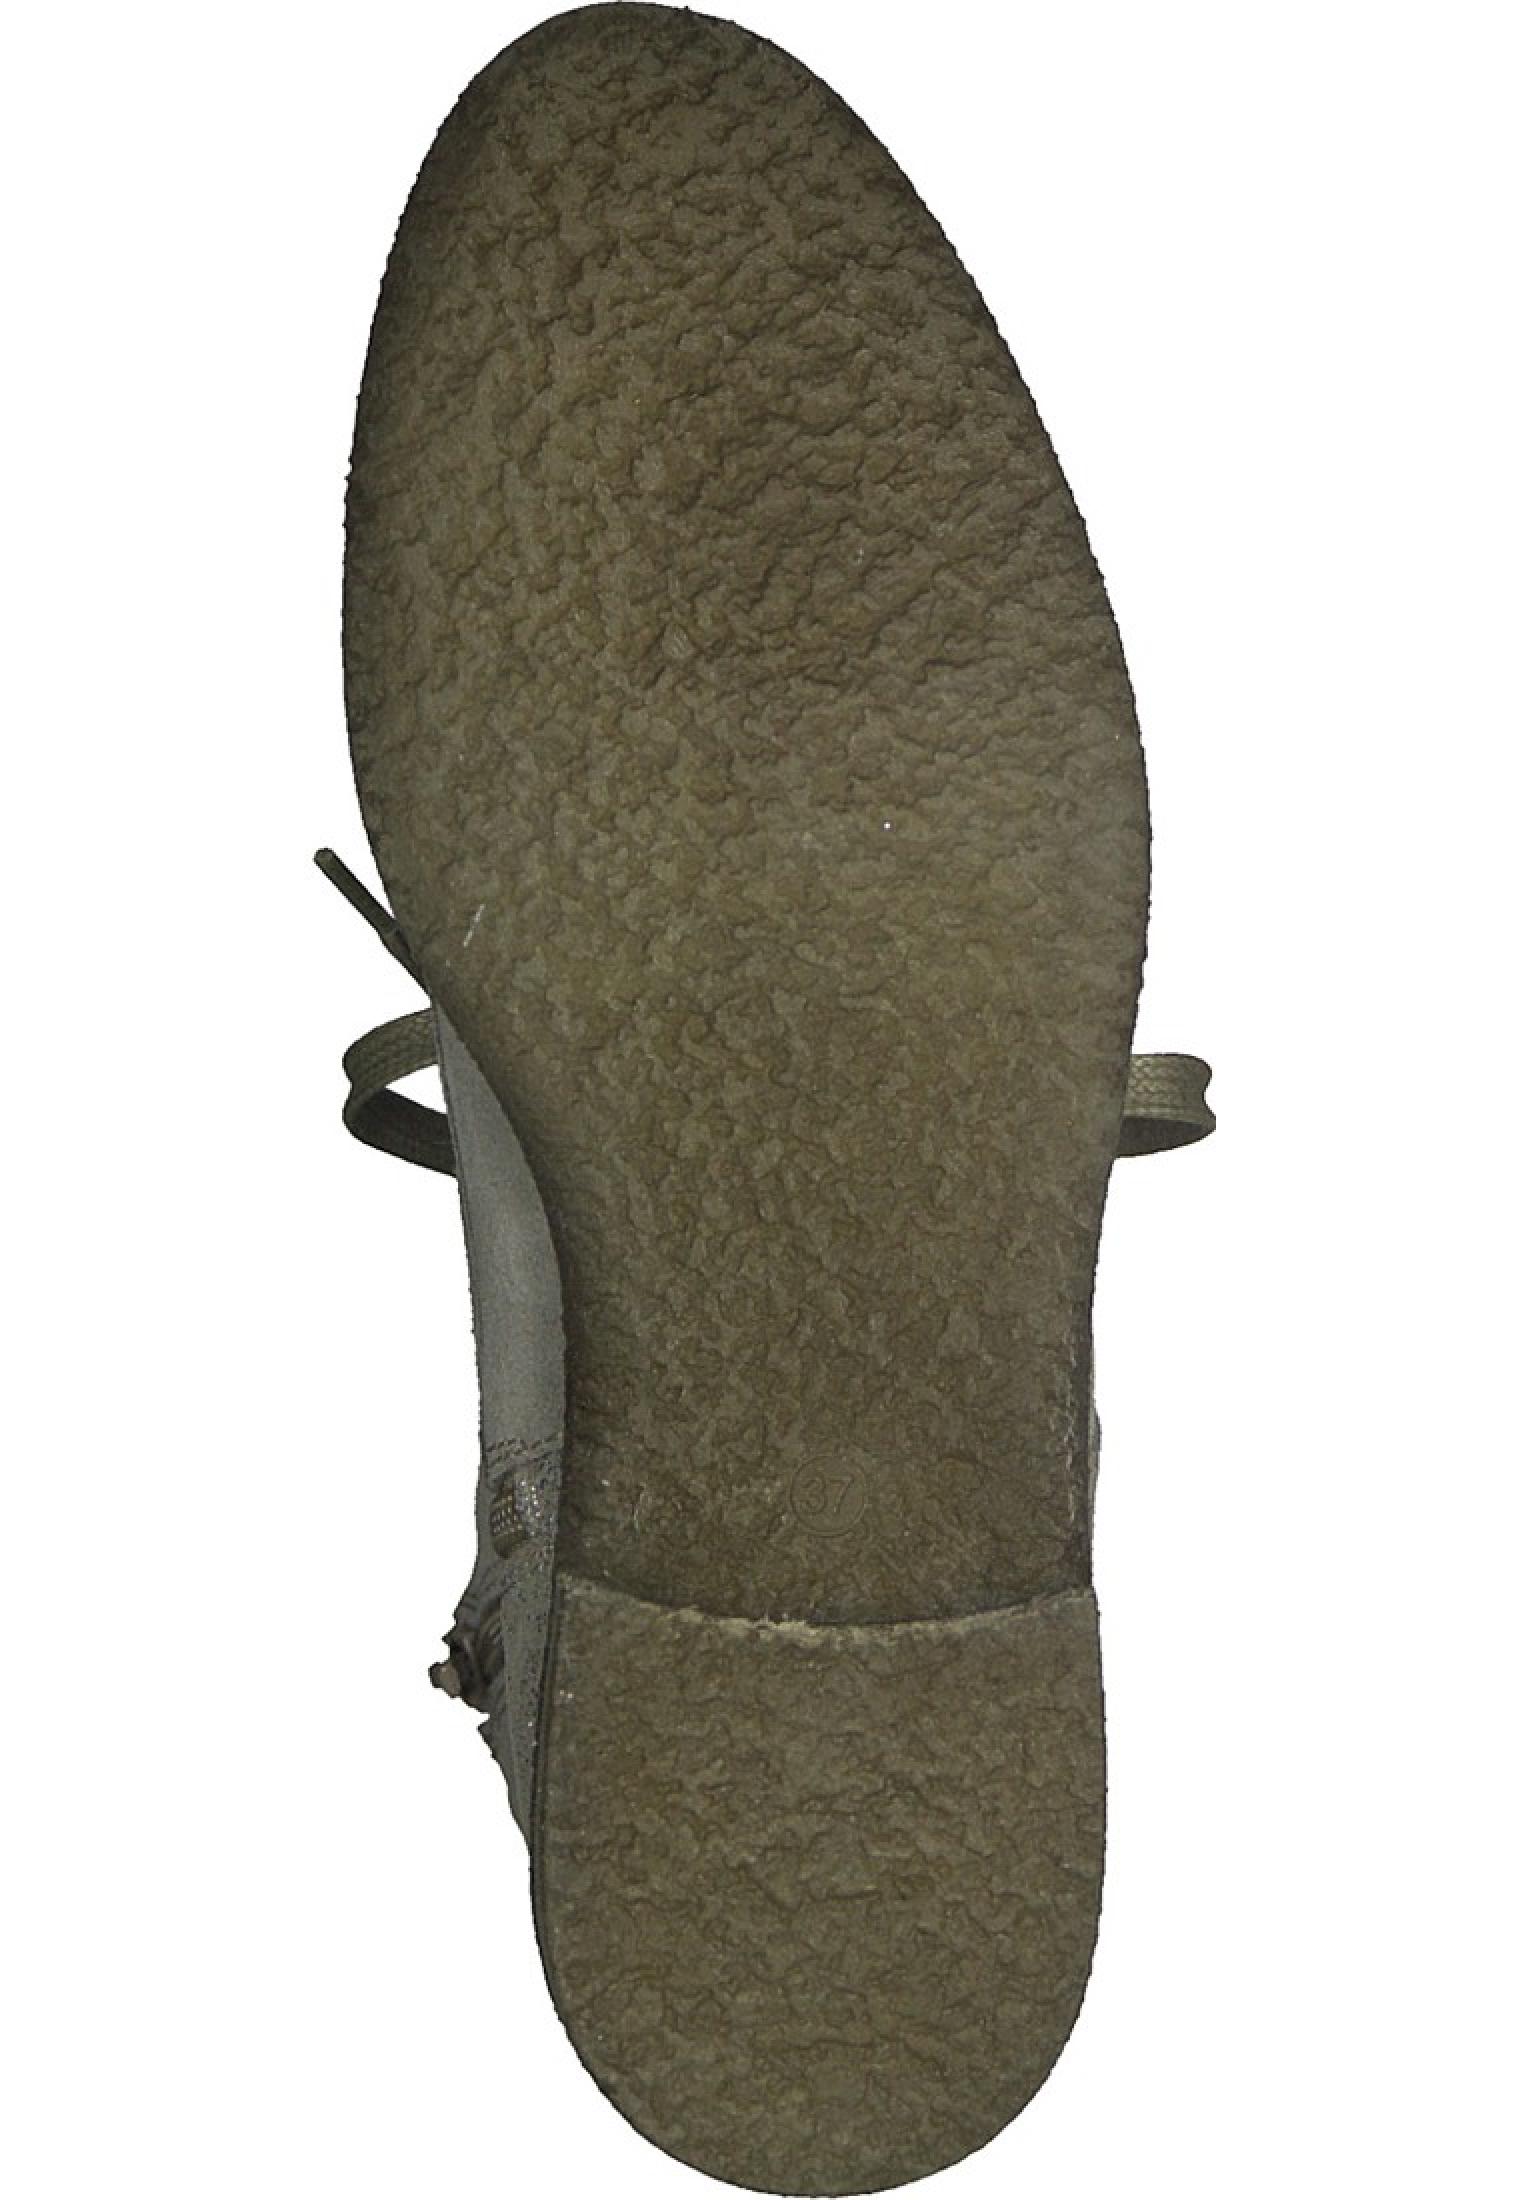 Tamaris Leder Schnürstiefelette Boots Grau 1 25287 29 331 Taupe Silver